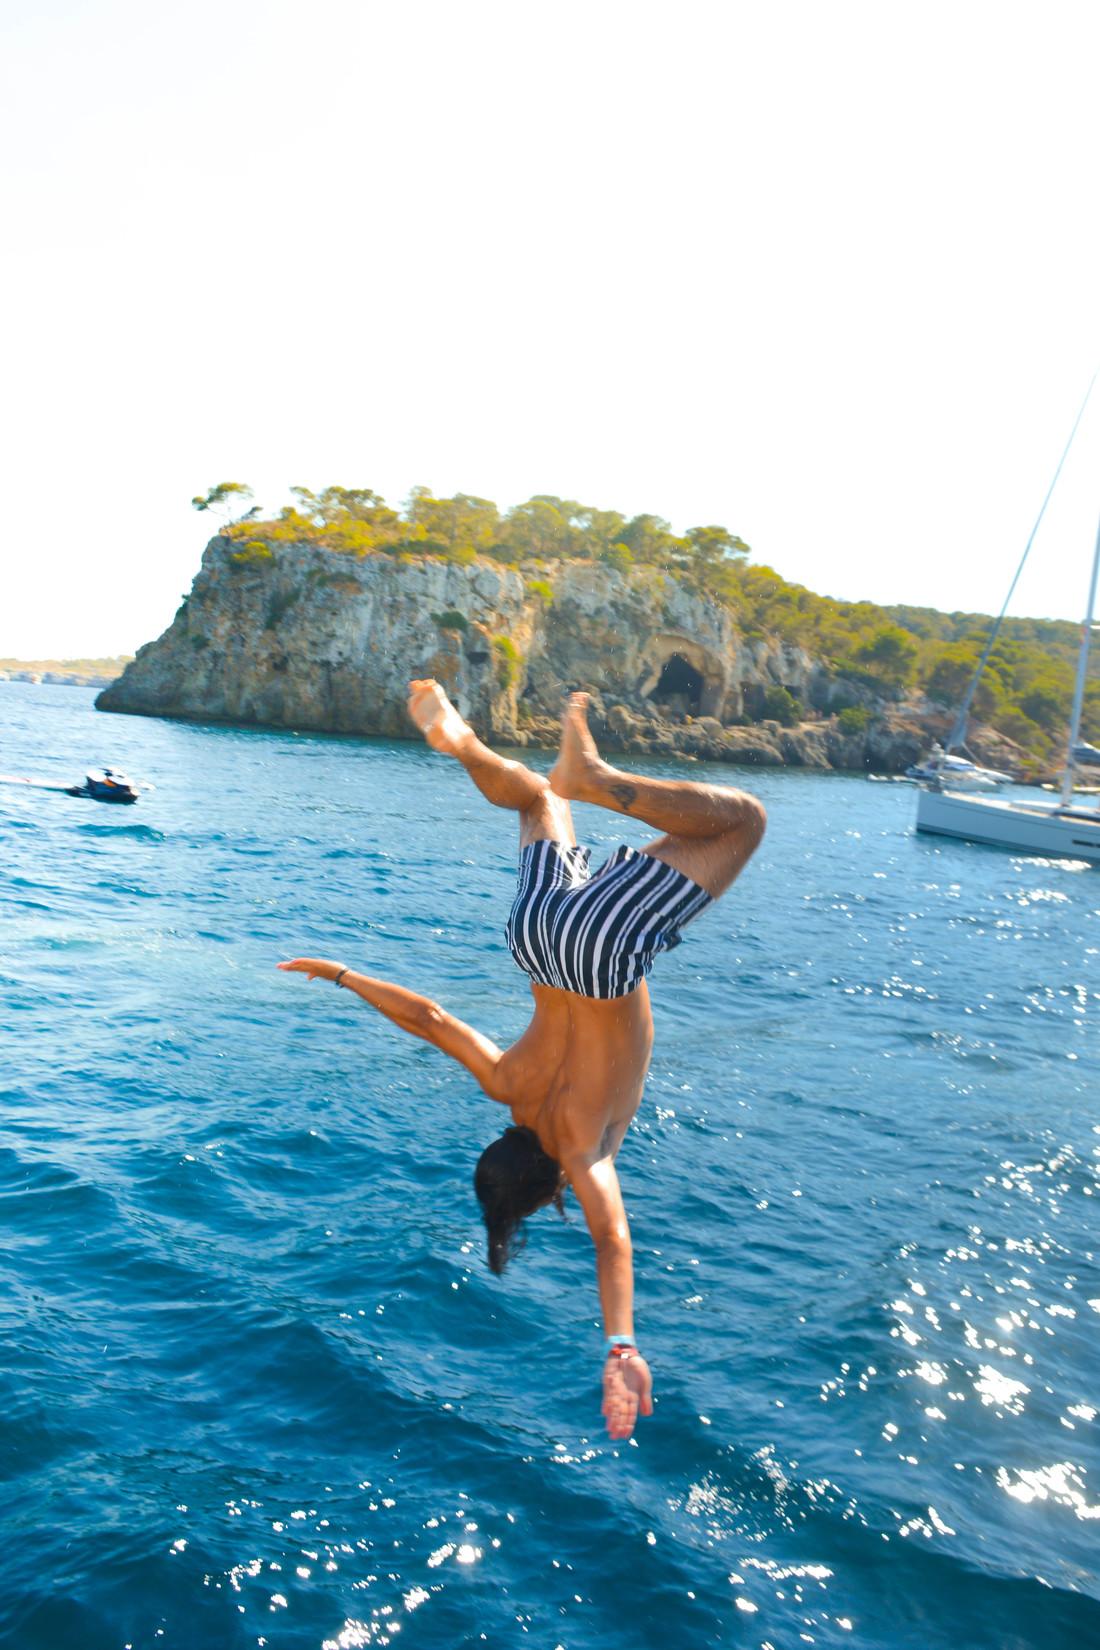 mallorca_sailing_perrirothenberg-6679.jpg